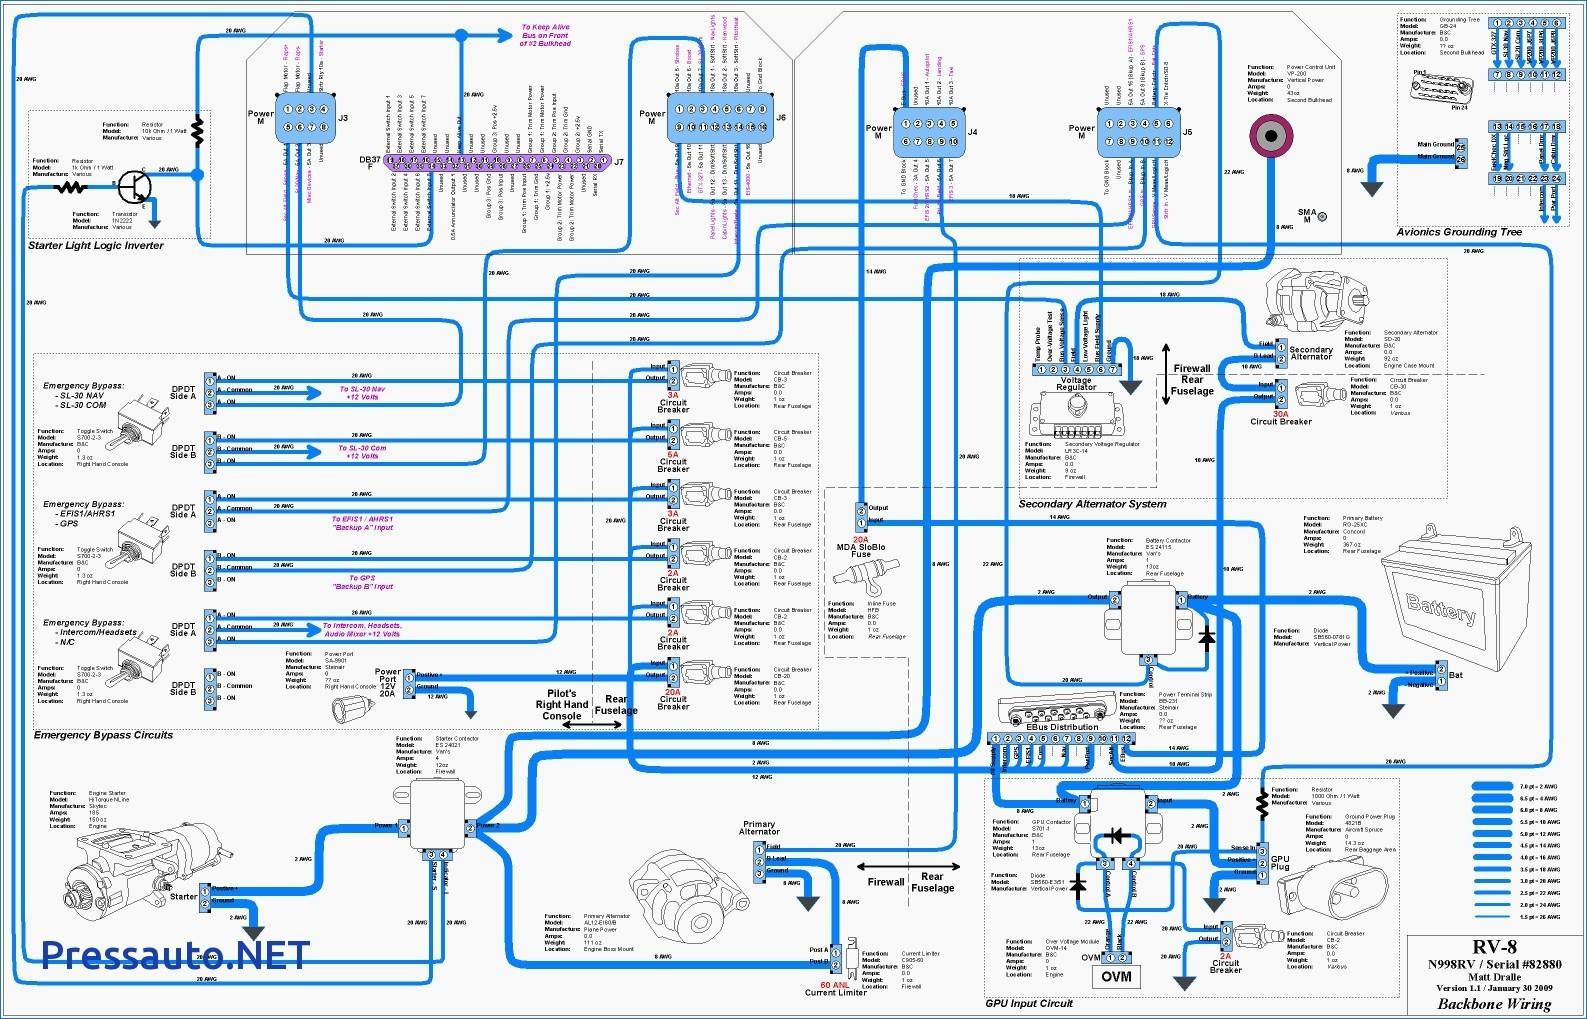 Wiring Diagrams Monaco Rv 2005 | Manual E-Books - Monaco Rv Wiring Diagram